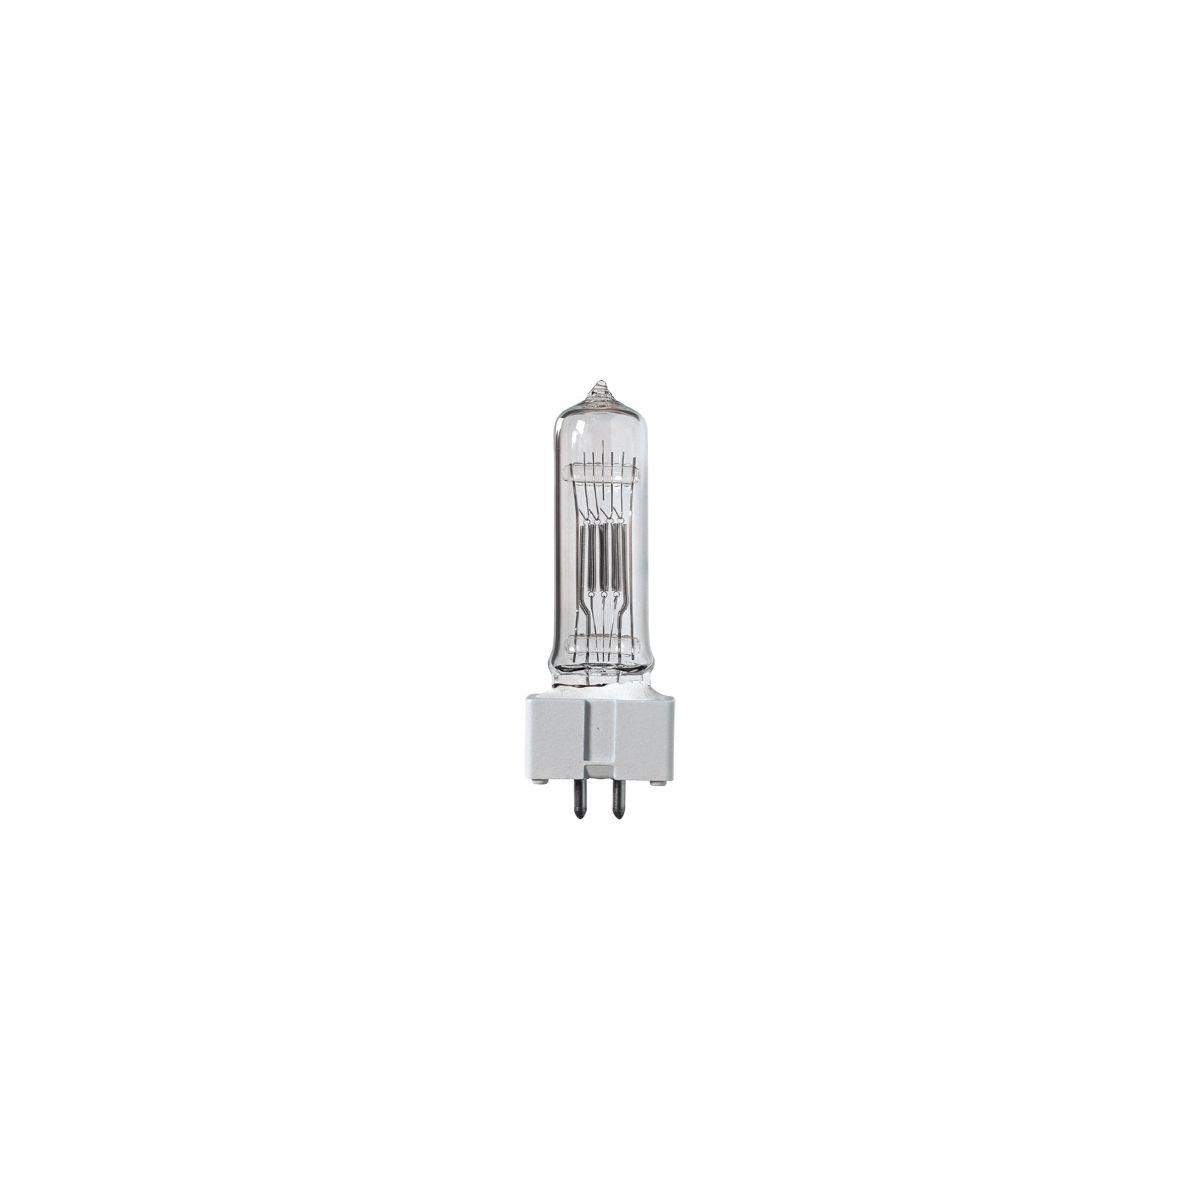 Ampoules halogènes - Osram / GE / Philips - CP23